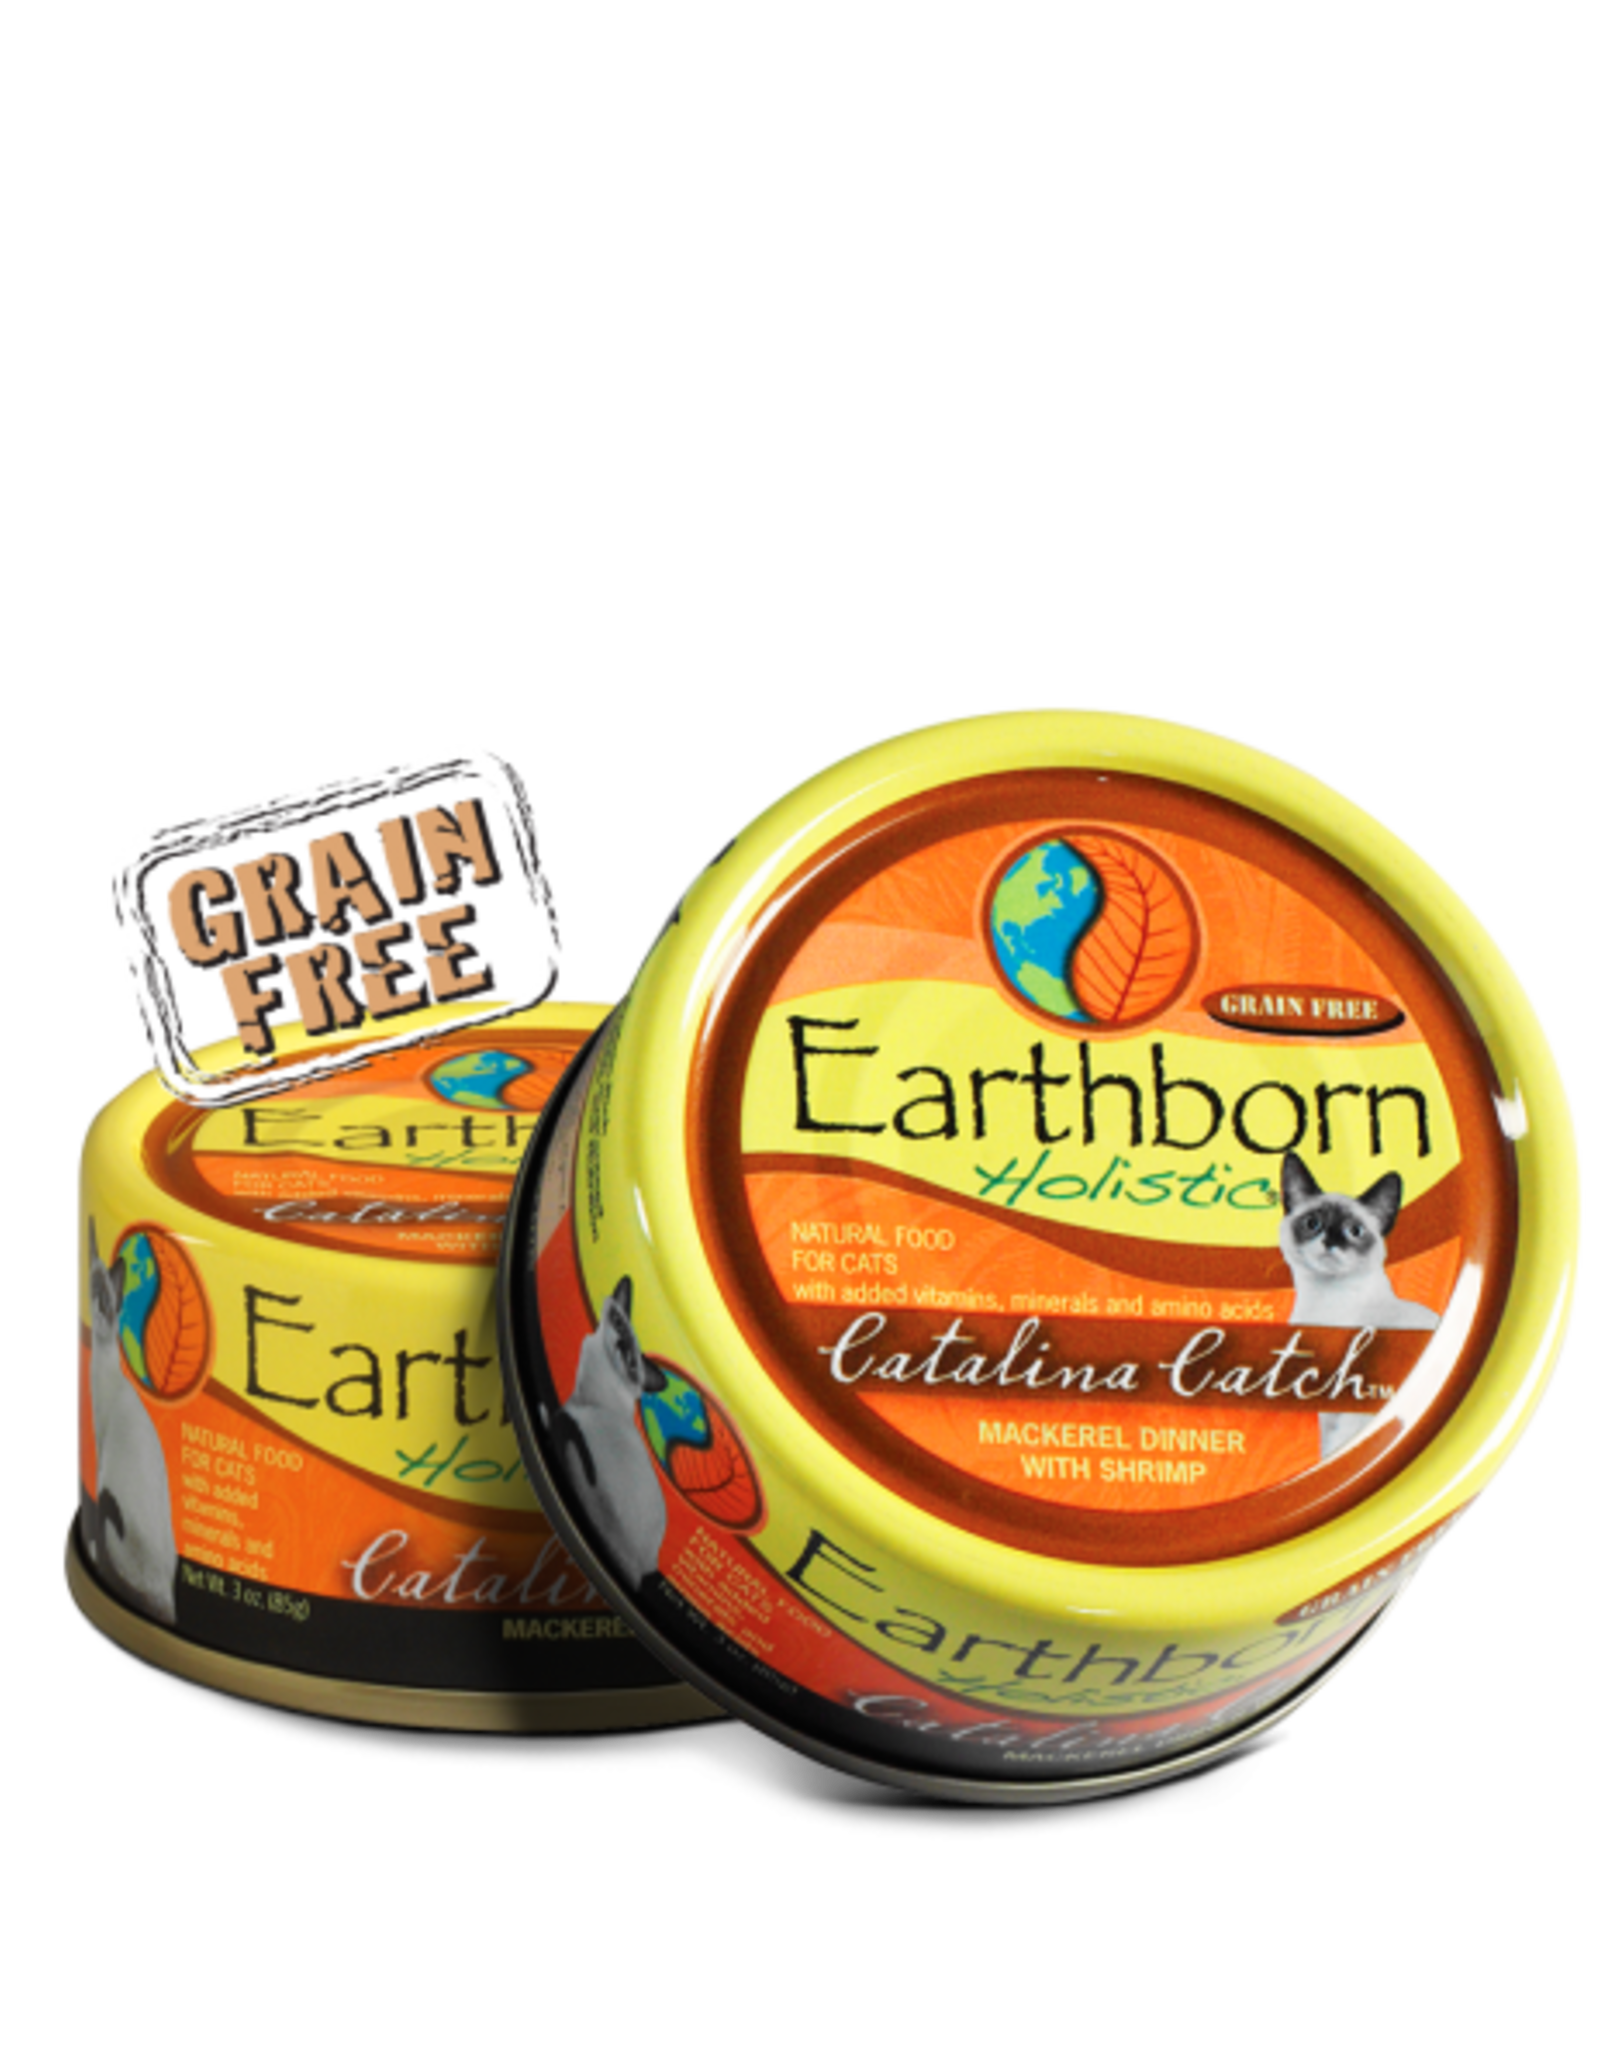 EARTHBORN EARTHBORN CAT GRAIN FREE CATALINA CATCH 5.5OZ CASE OF 24